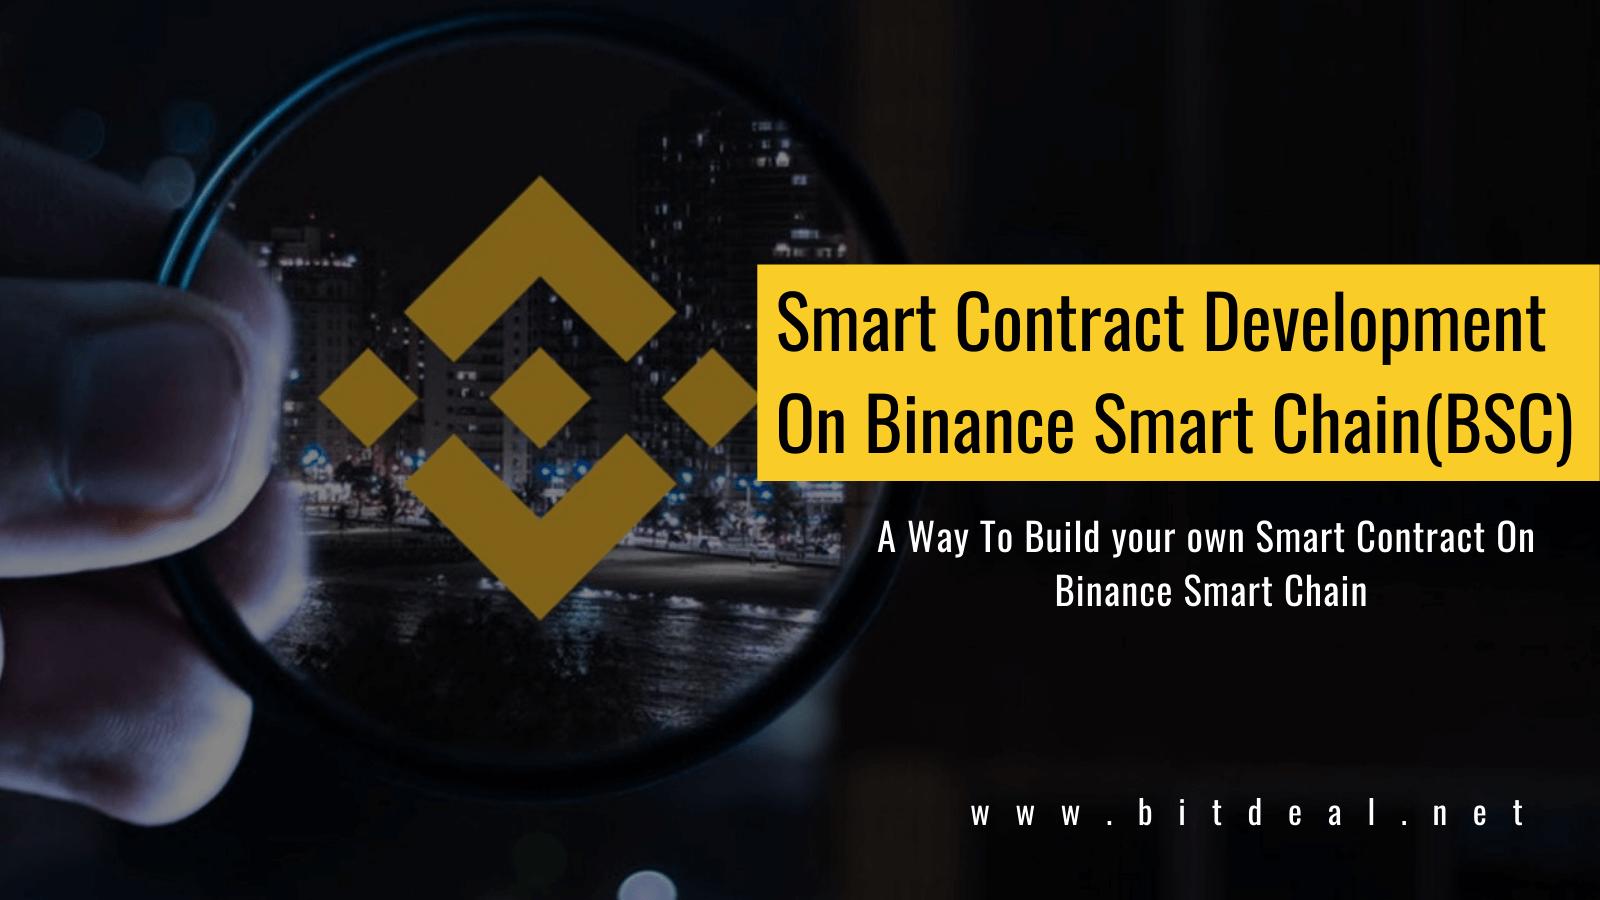 Binance Smart Chain Development - Create Smart Contracts On Binance Smart Chain